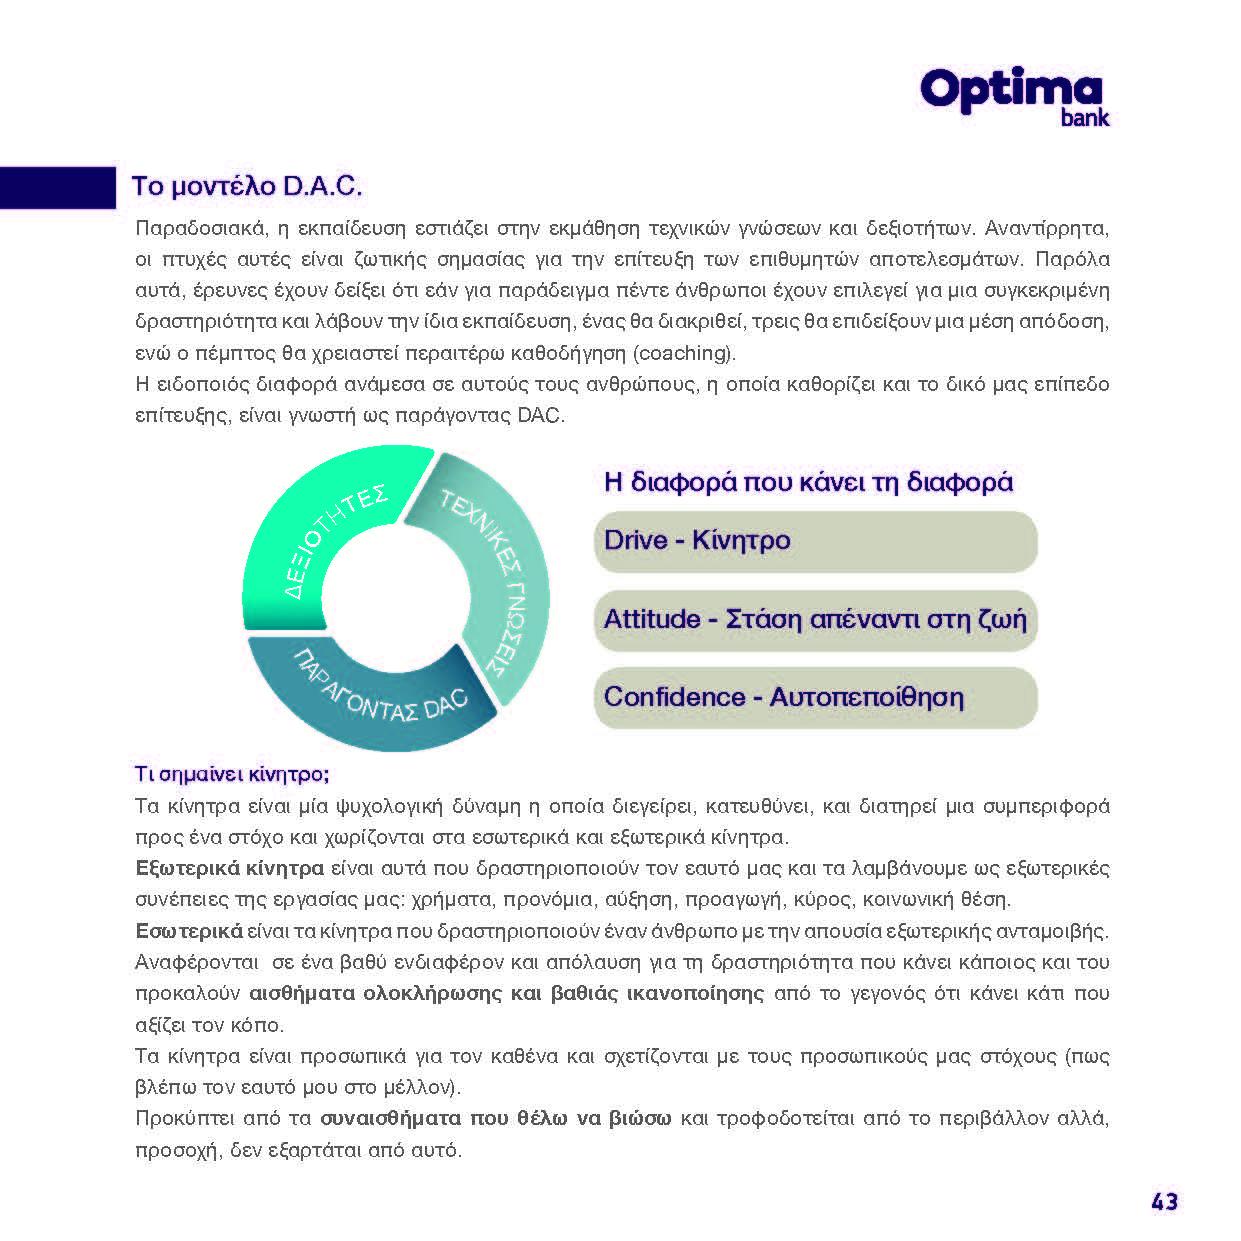 https://www.jib.gr/wp-content/uploads/2020/09/OPTIMA-BANK-BOOKLET-WEB_Page_043.jpg